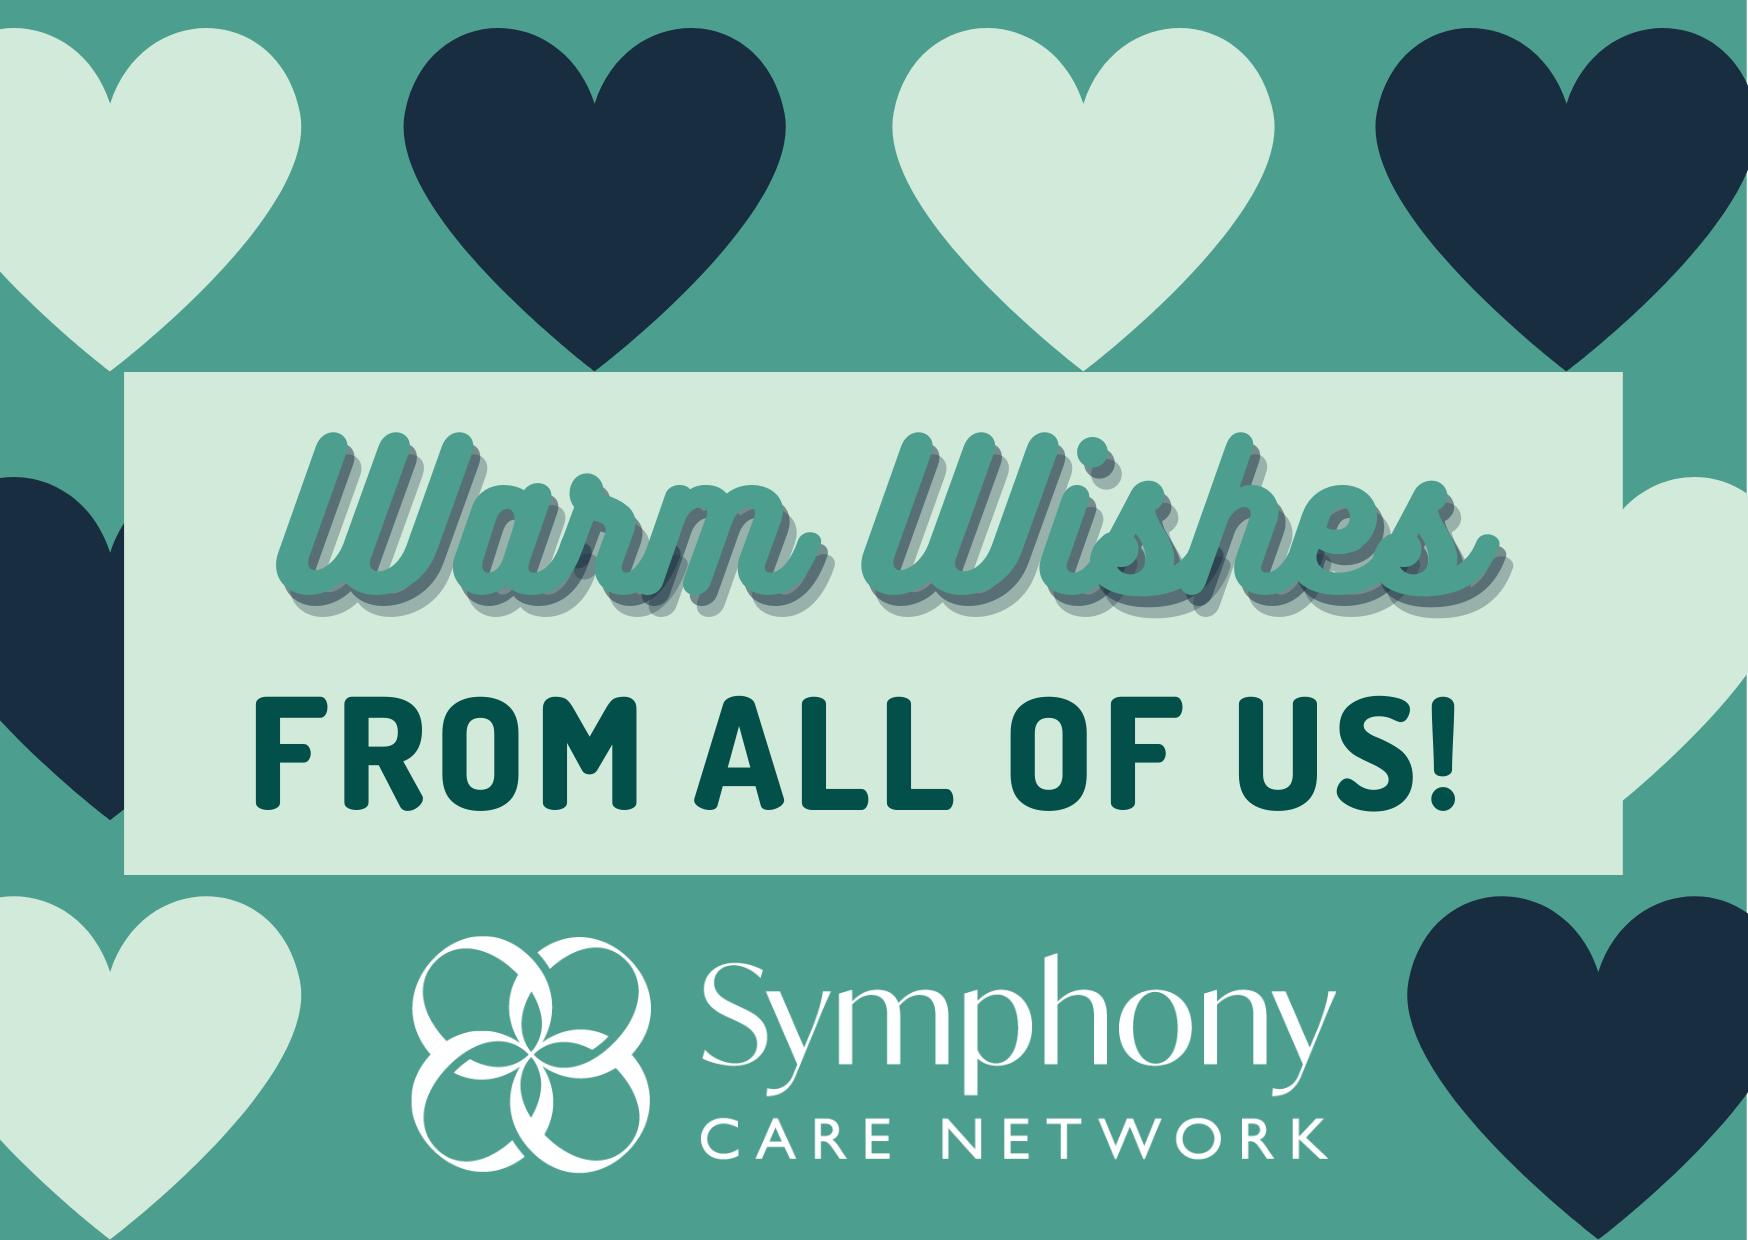 Warm Wishes!